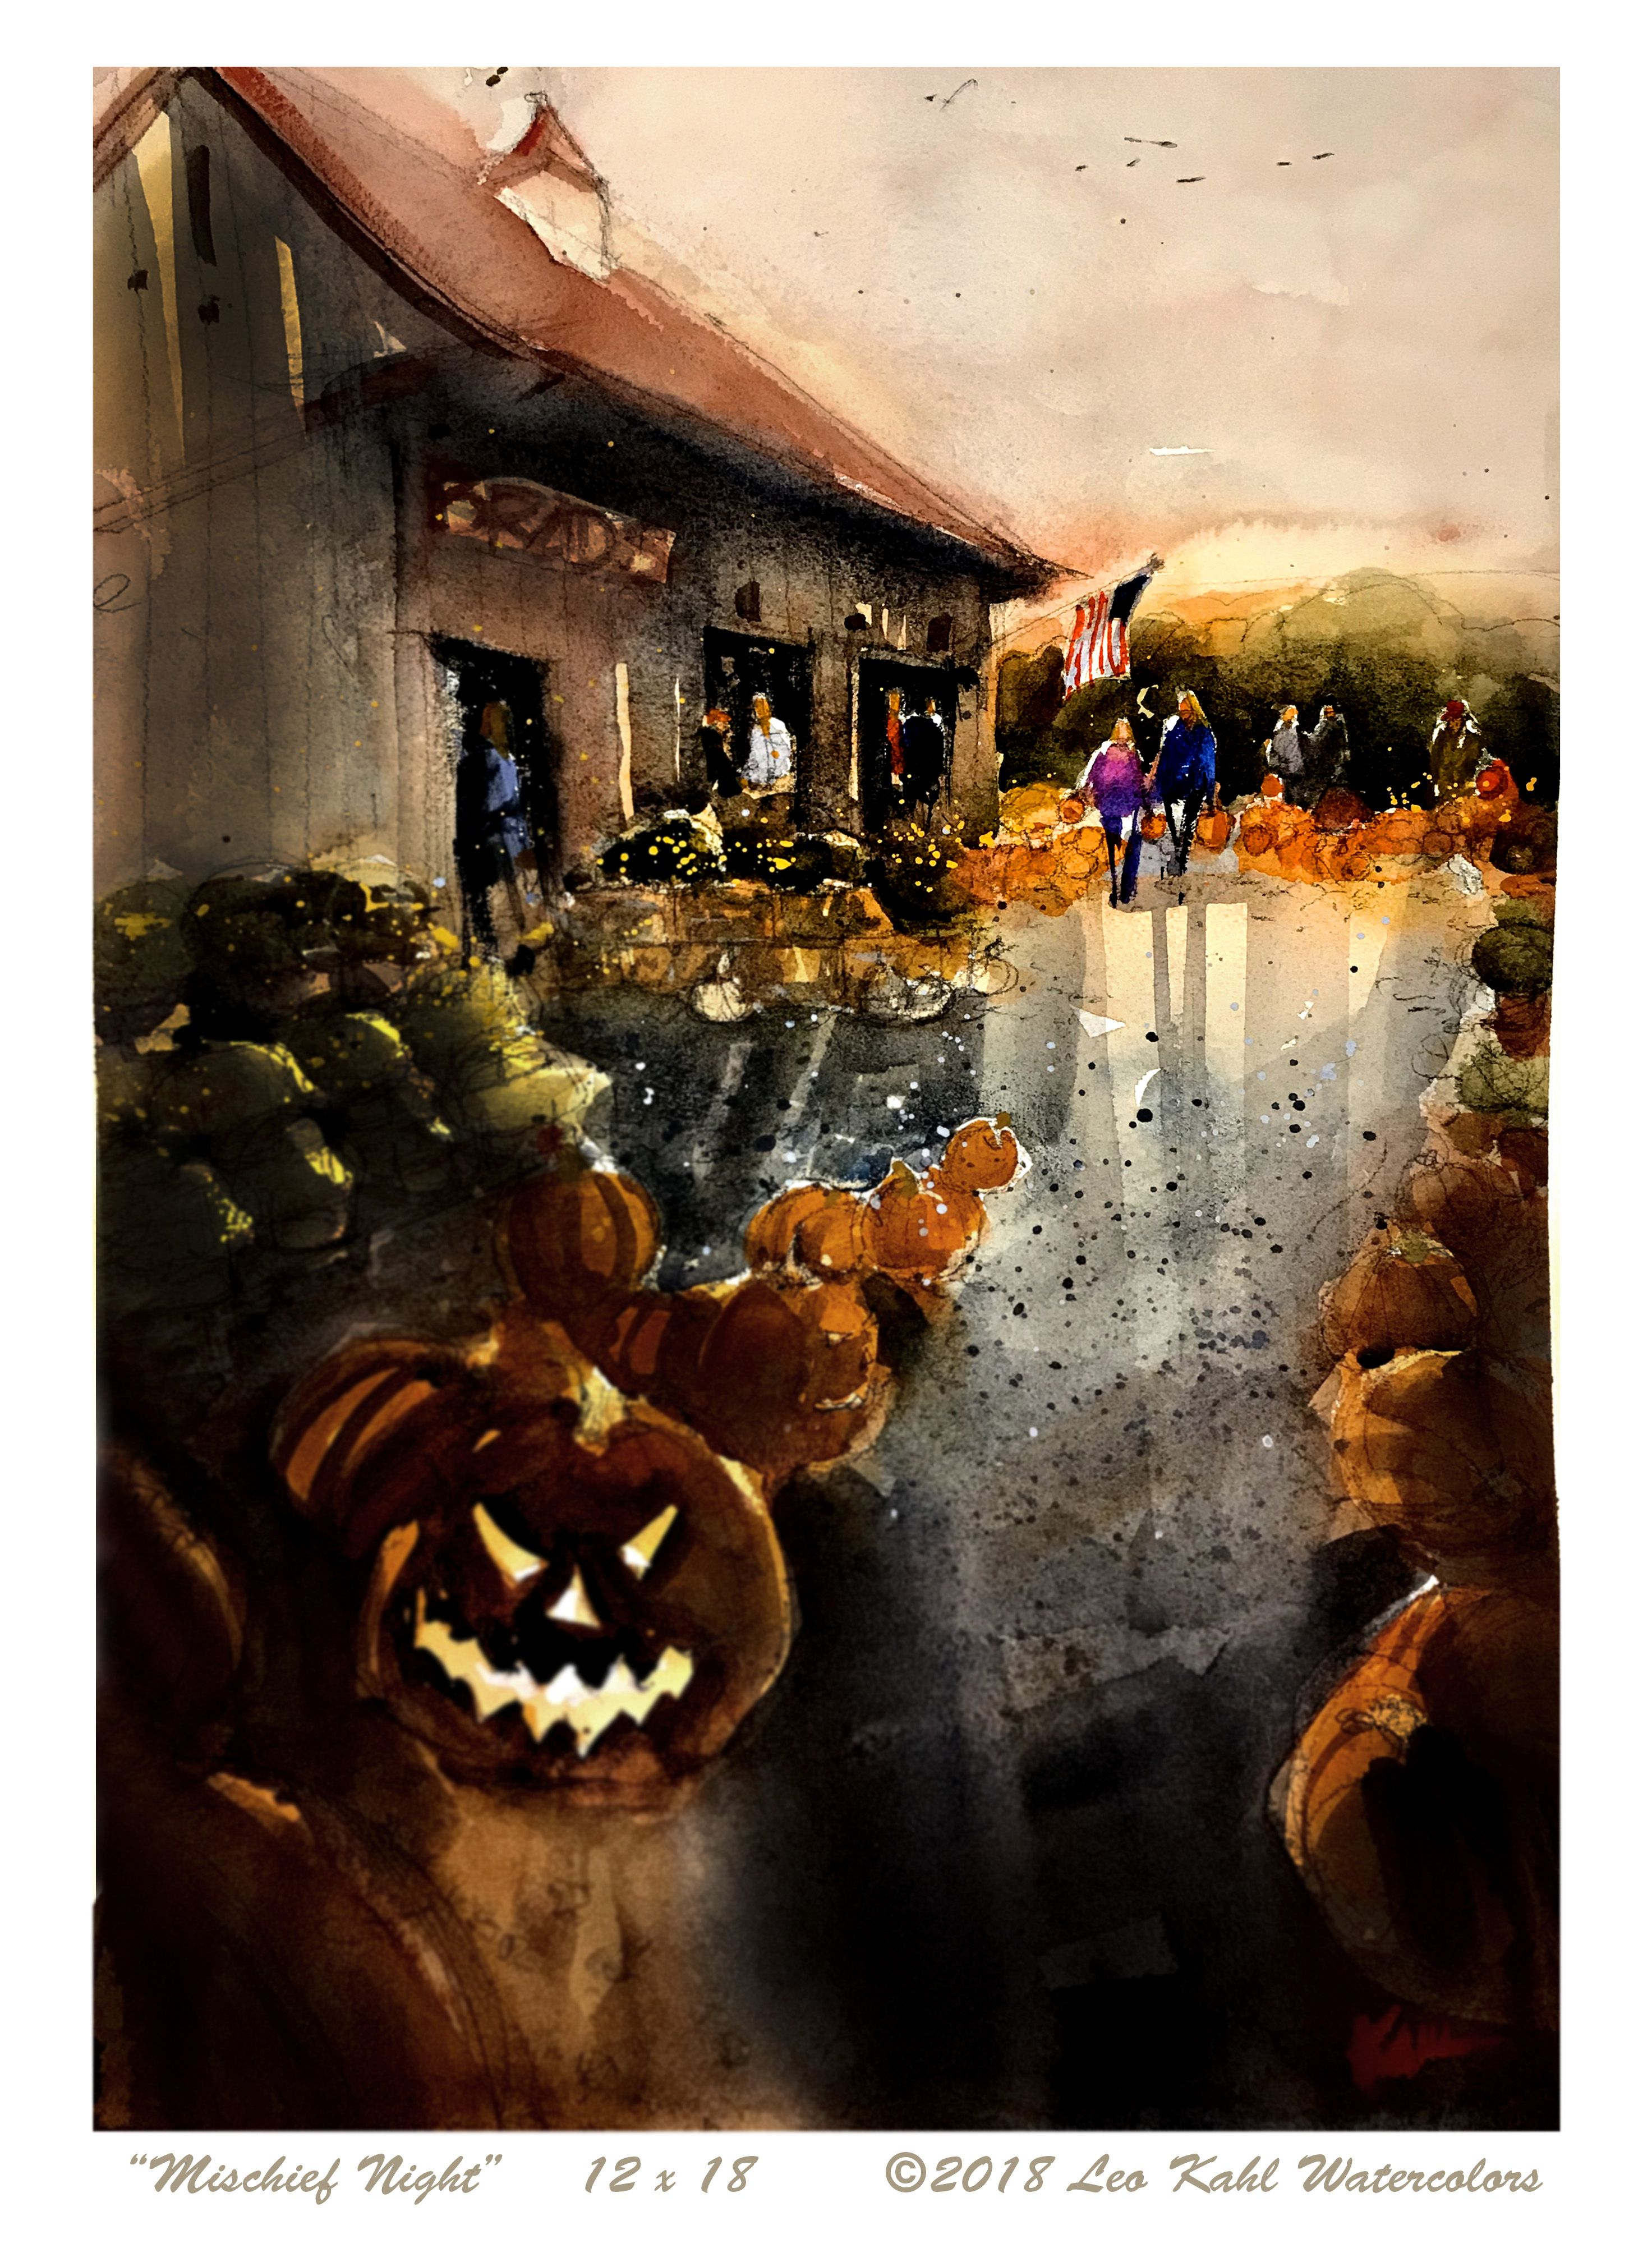 Mischief Night By Leo Kahl Watercolors Art Watercolor Watercolor Art